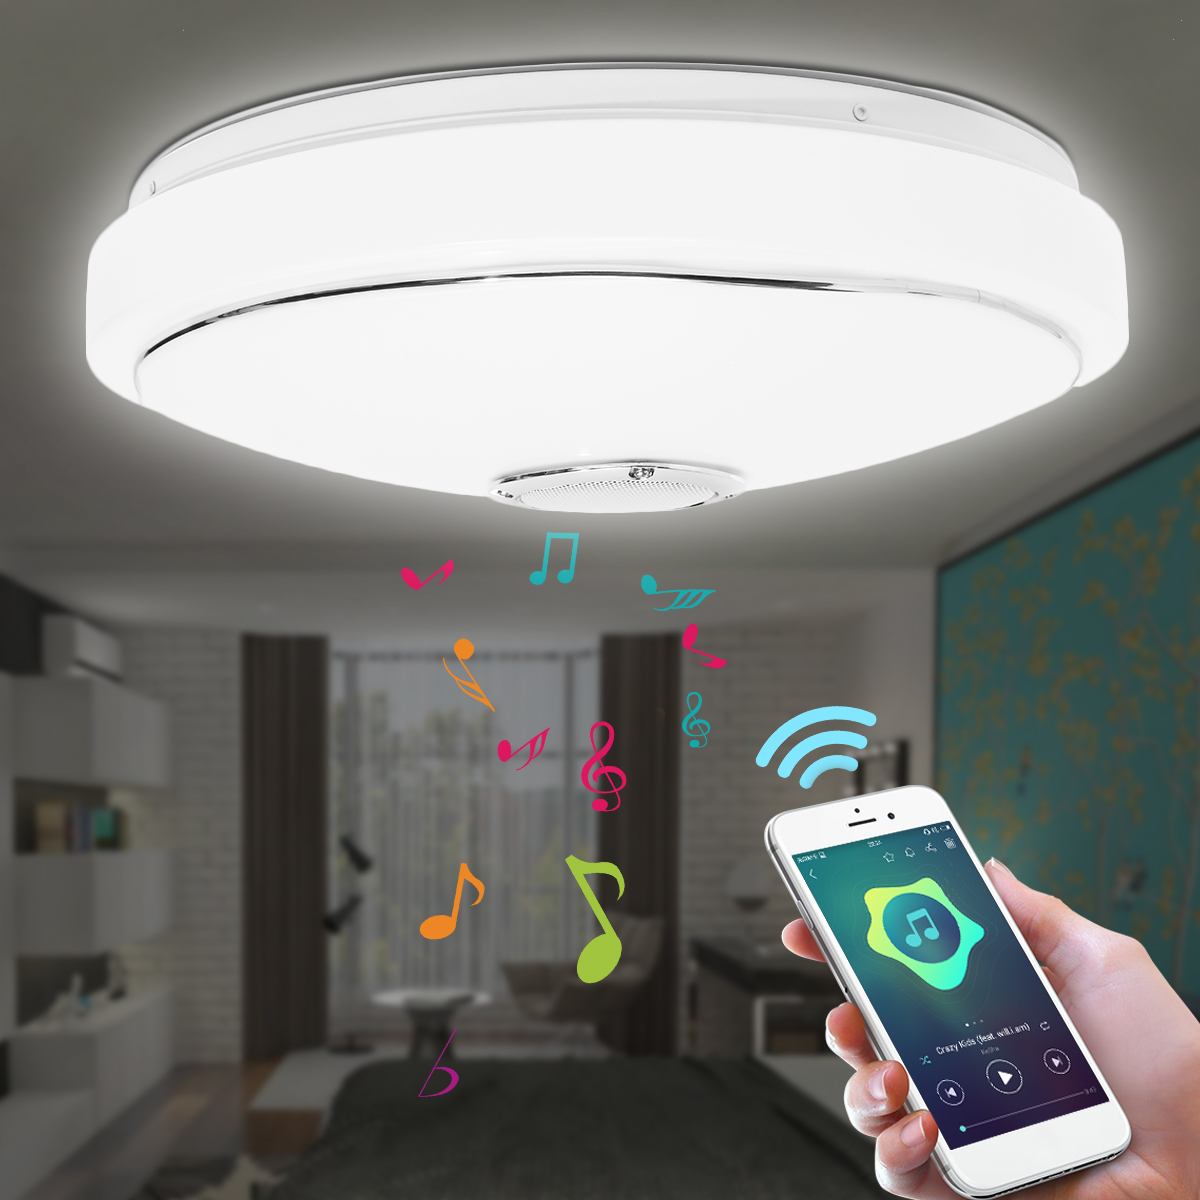 Smuxi Bluetooth Music LED Ceiling Light with Controler Color Changes Light Flush Mount Lamp For Home Decor Bedroom Light Fixture